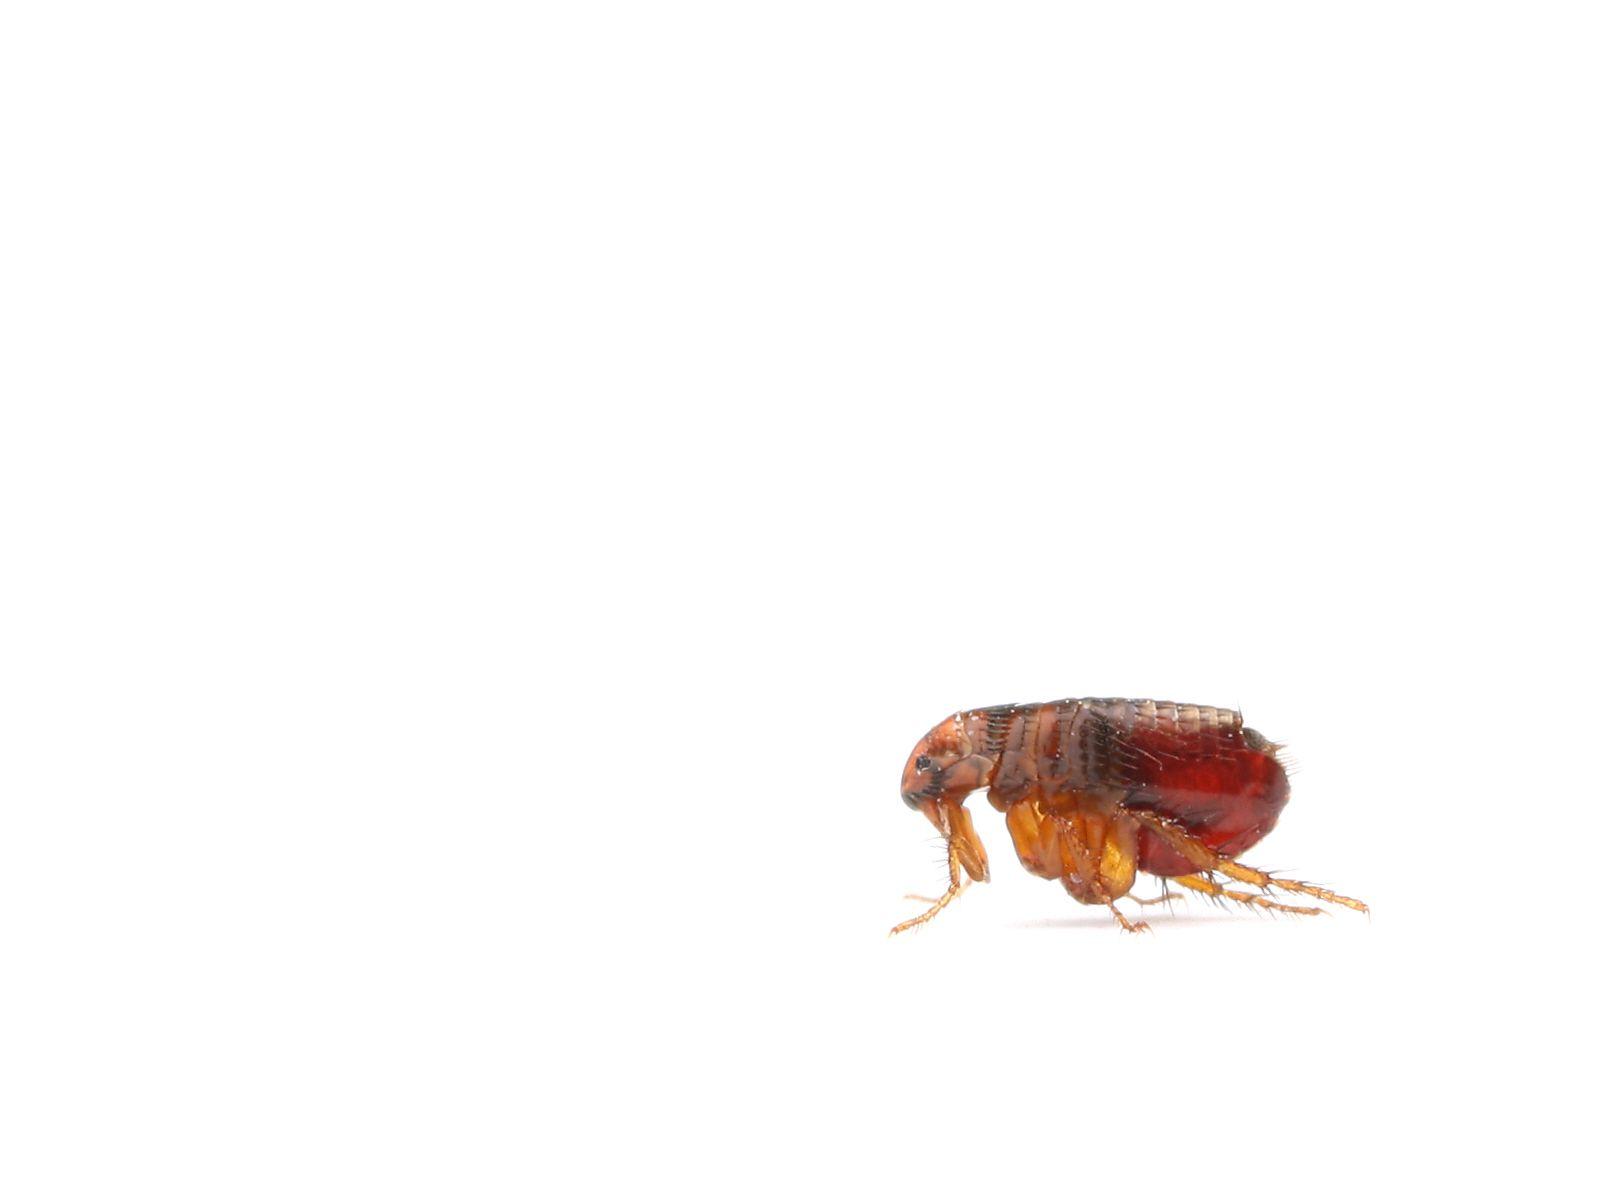 diatomaceous earth de for flea control